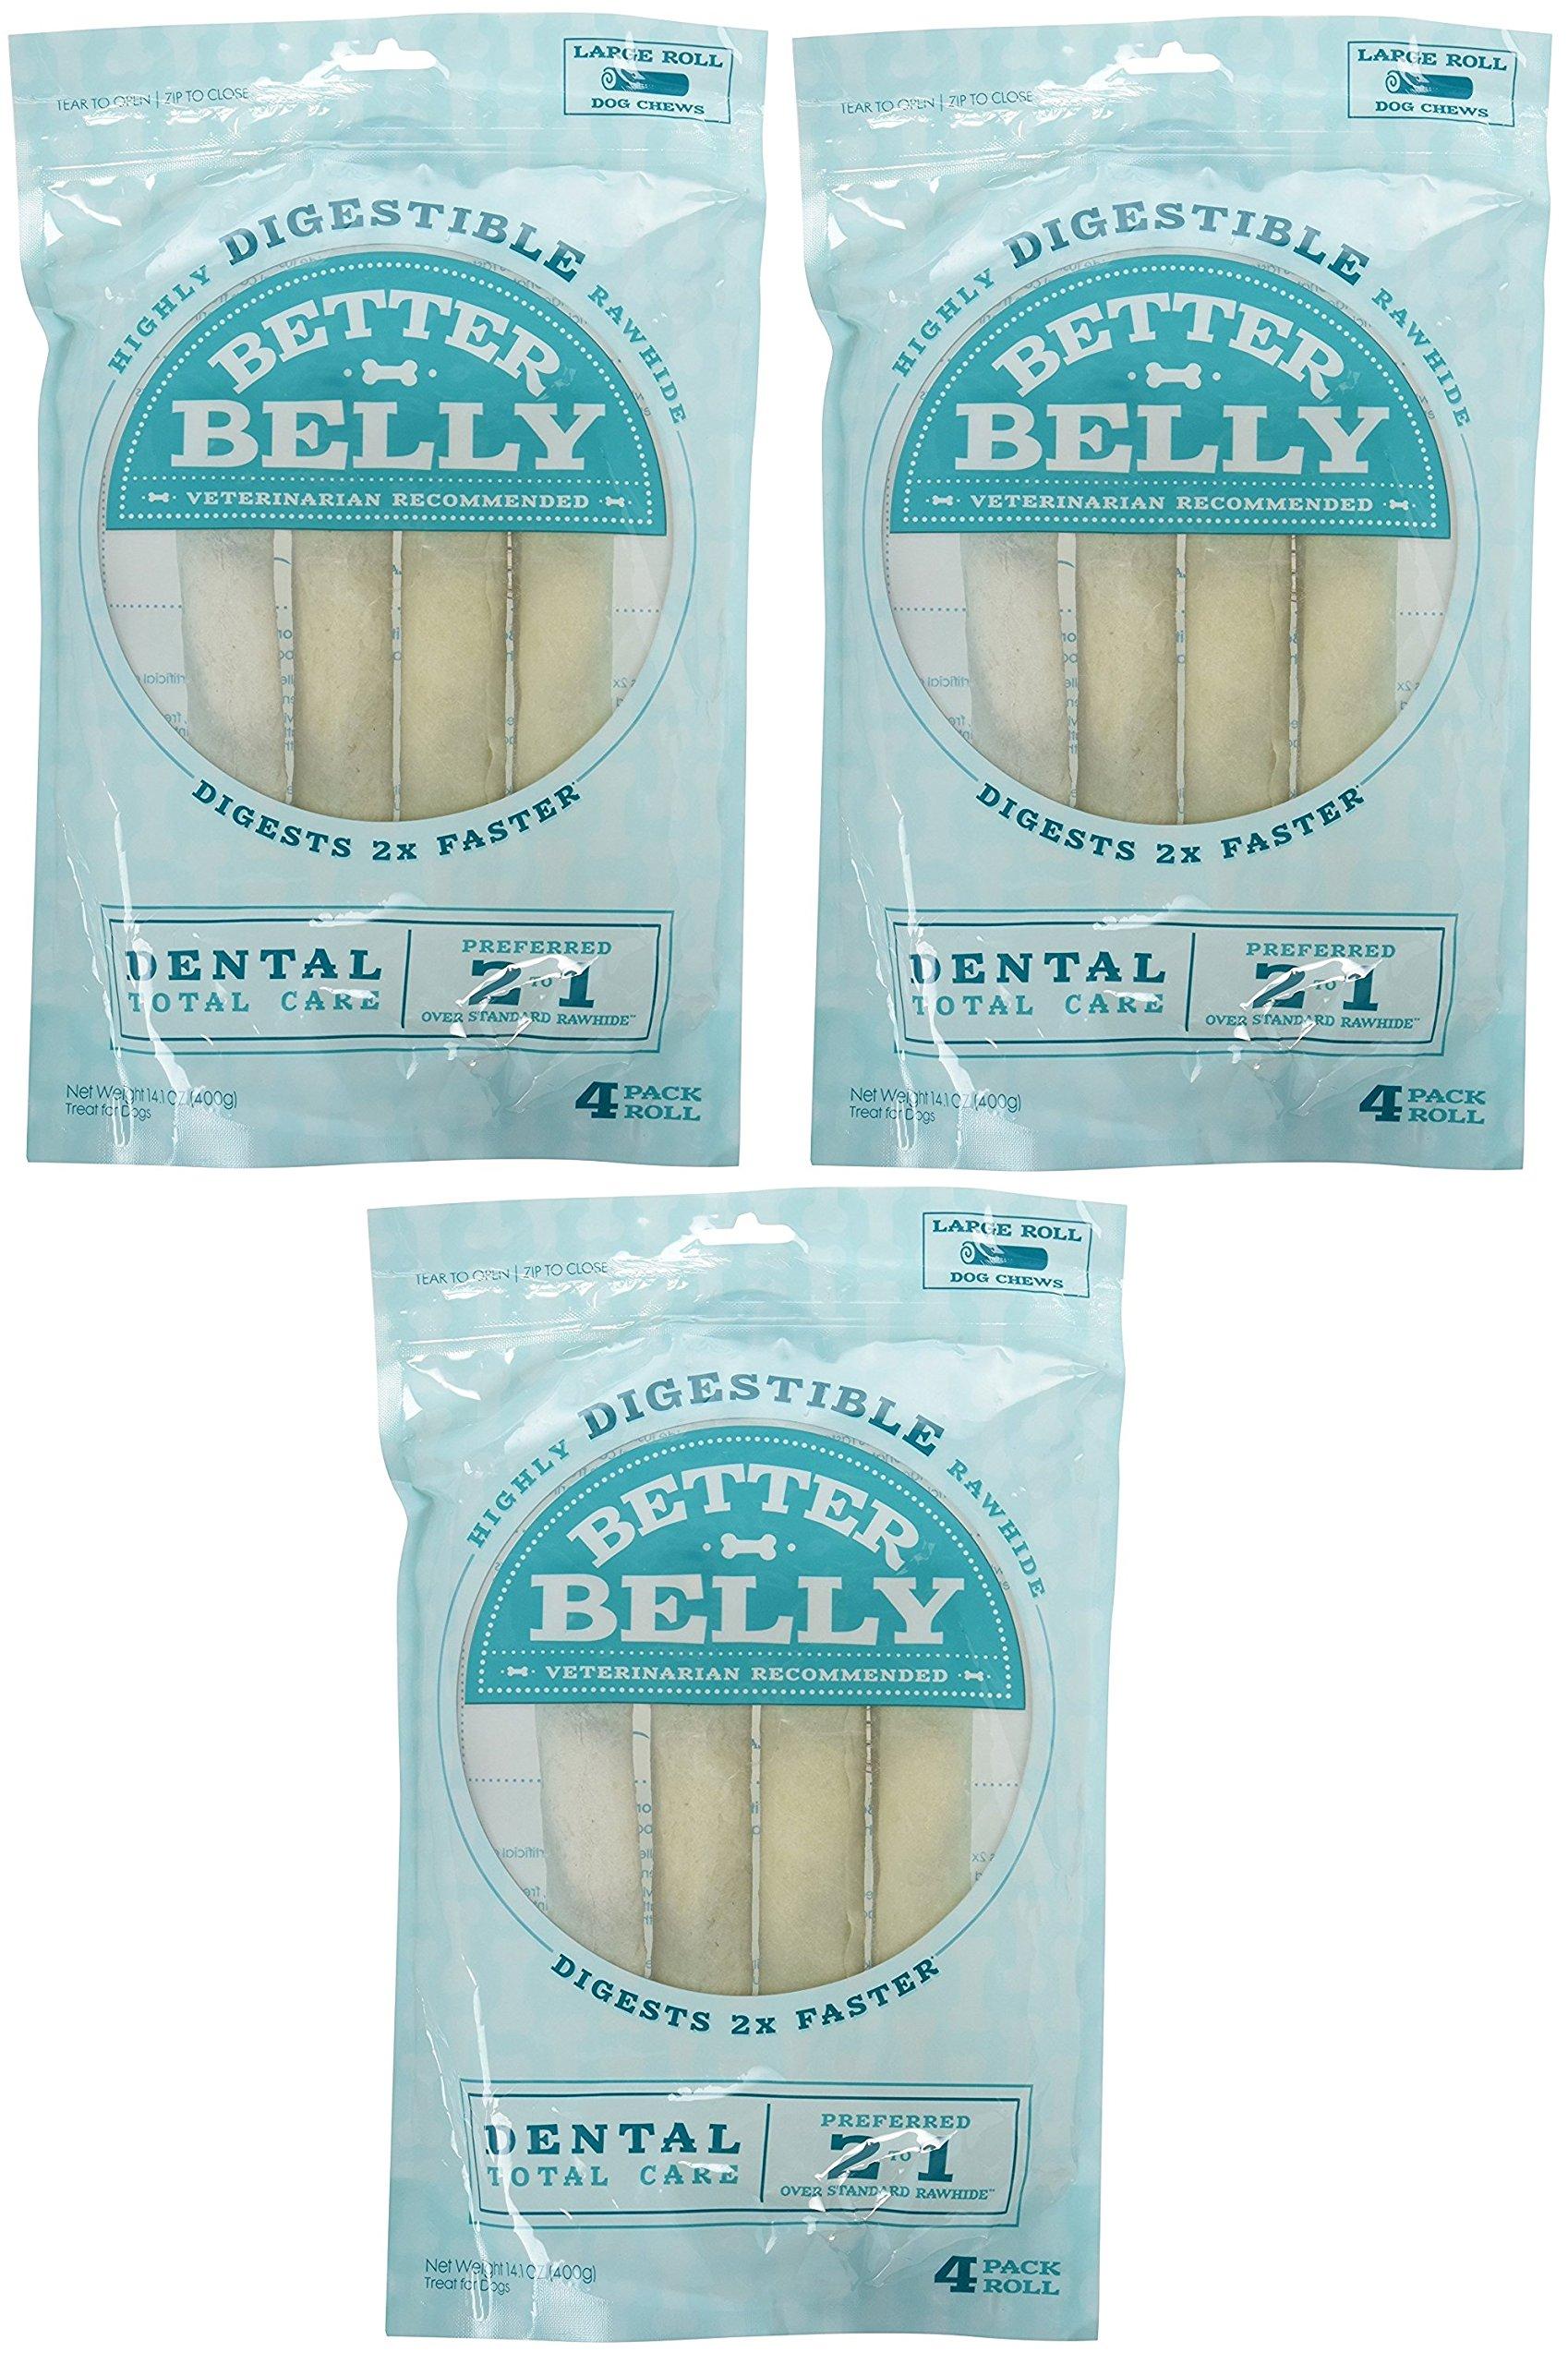 Better Belly Large Dental Rolls 12 Pack (3 Packages, 4 Bones Each)